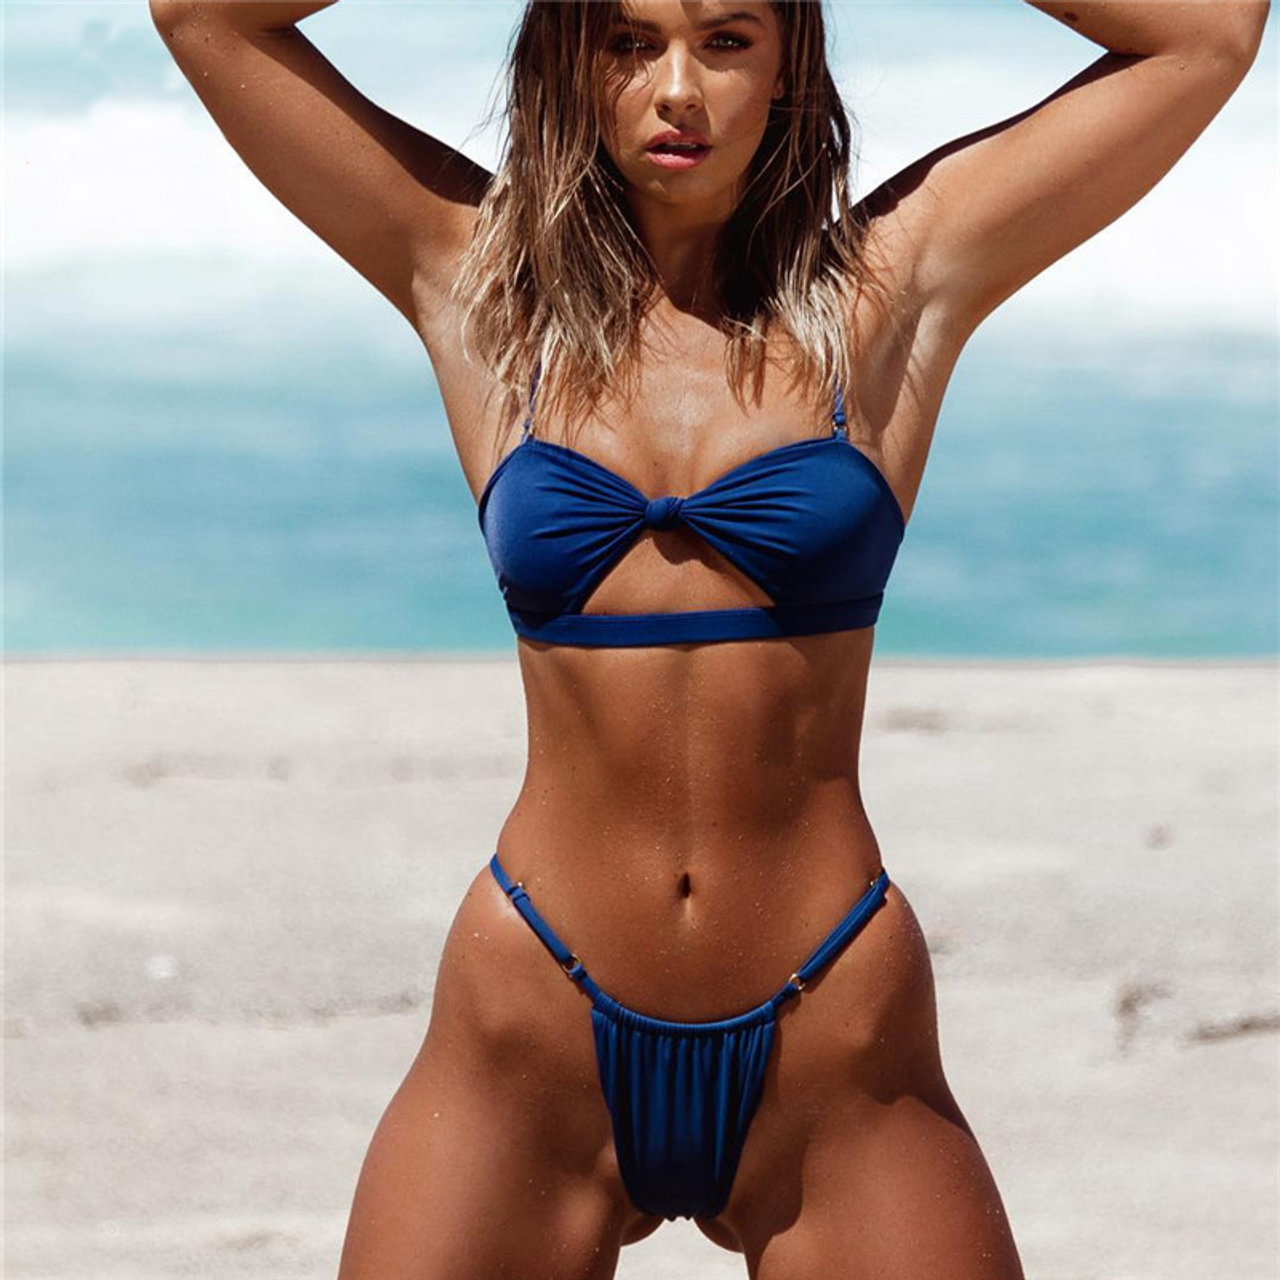 Sexy swimsuit photos